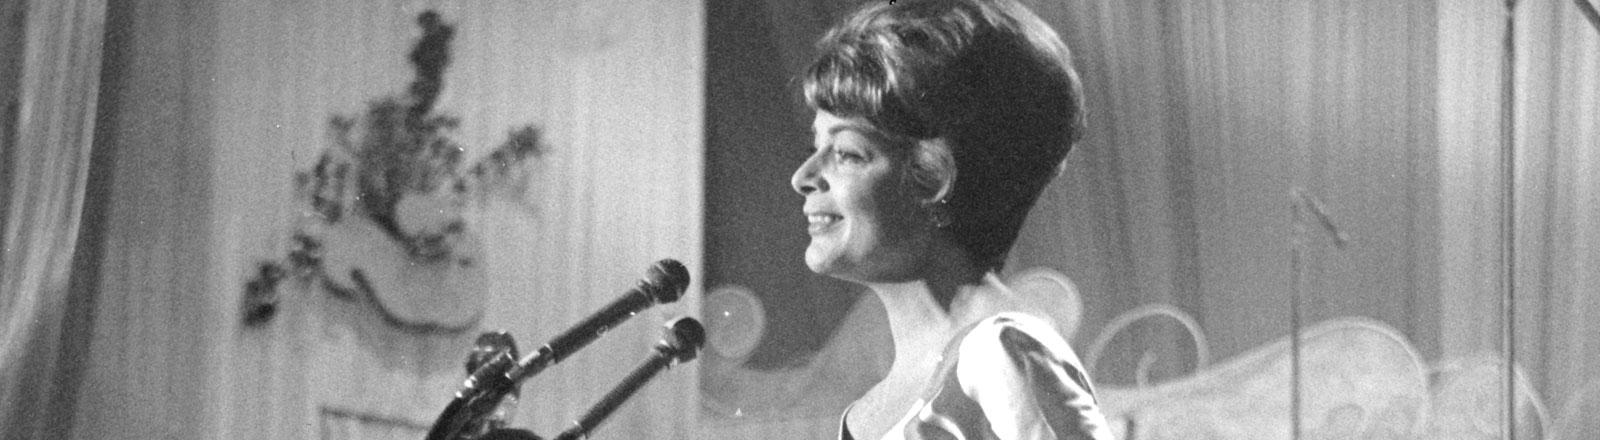 Lys Assia hat 1956 den ersten Grandprix d'Eurovision de la Chanson gewonnen.